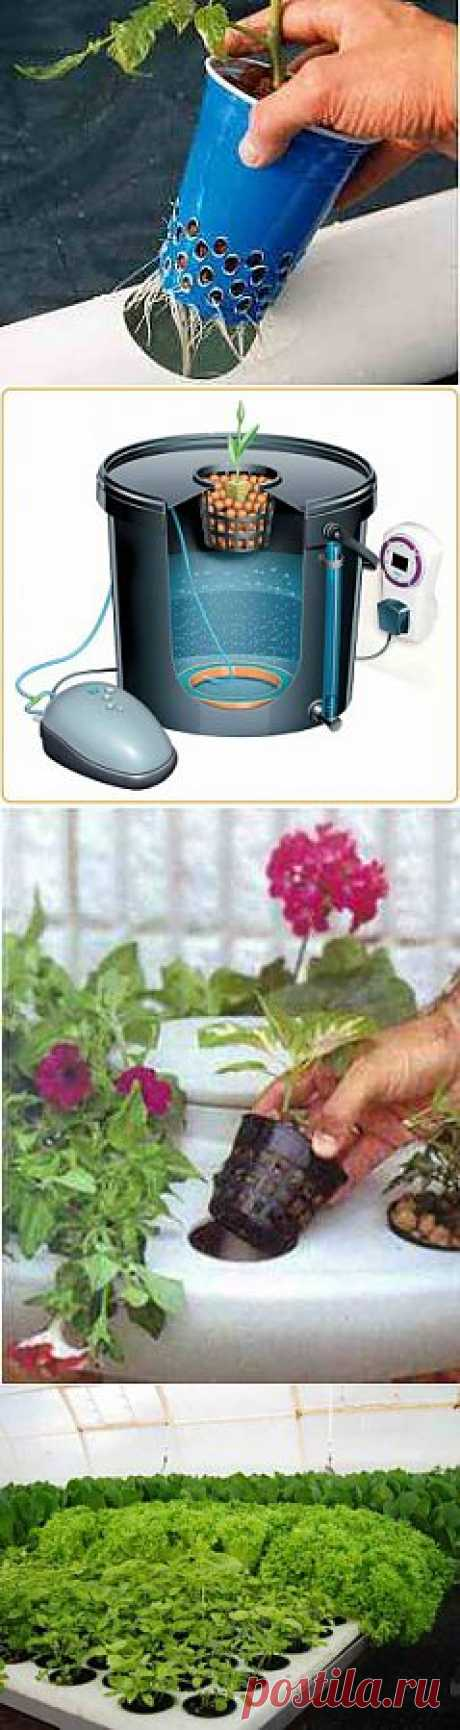 Выращивание методом гидропоники в домашних условиях | Дача - впрок